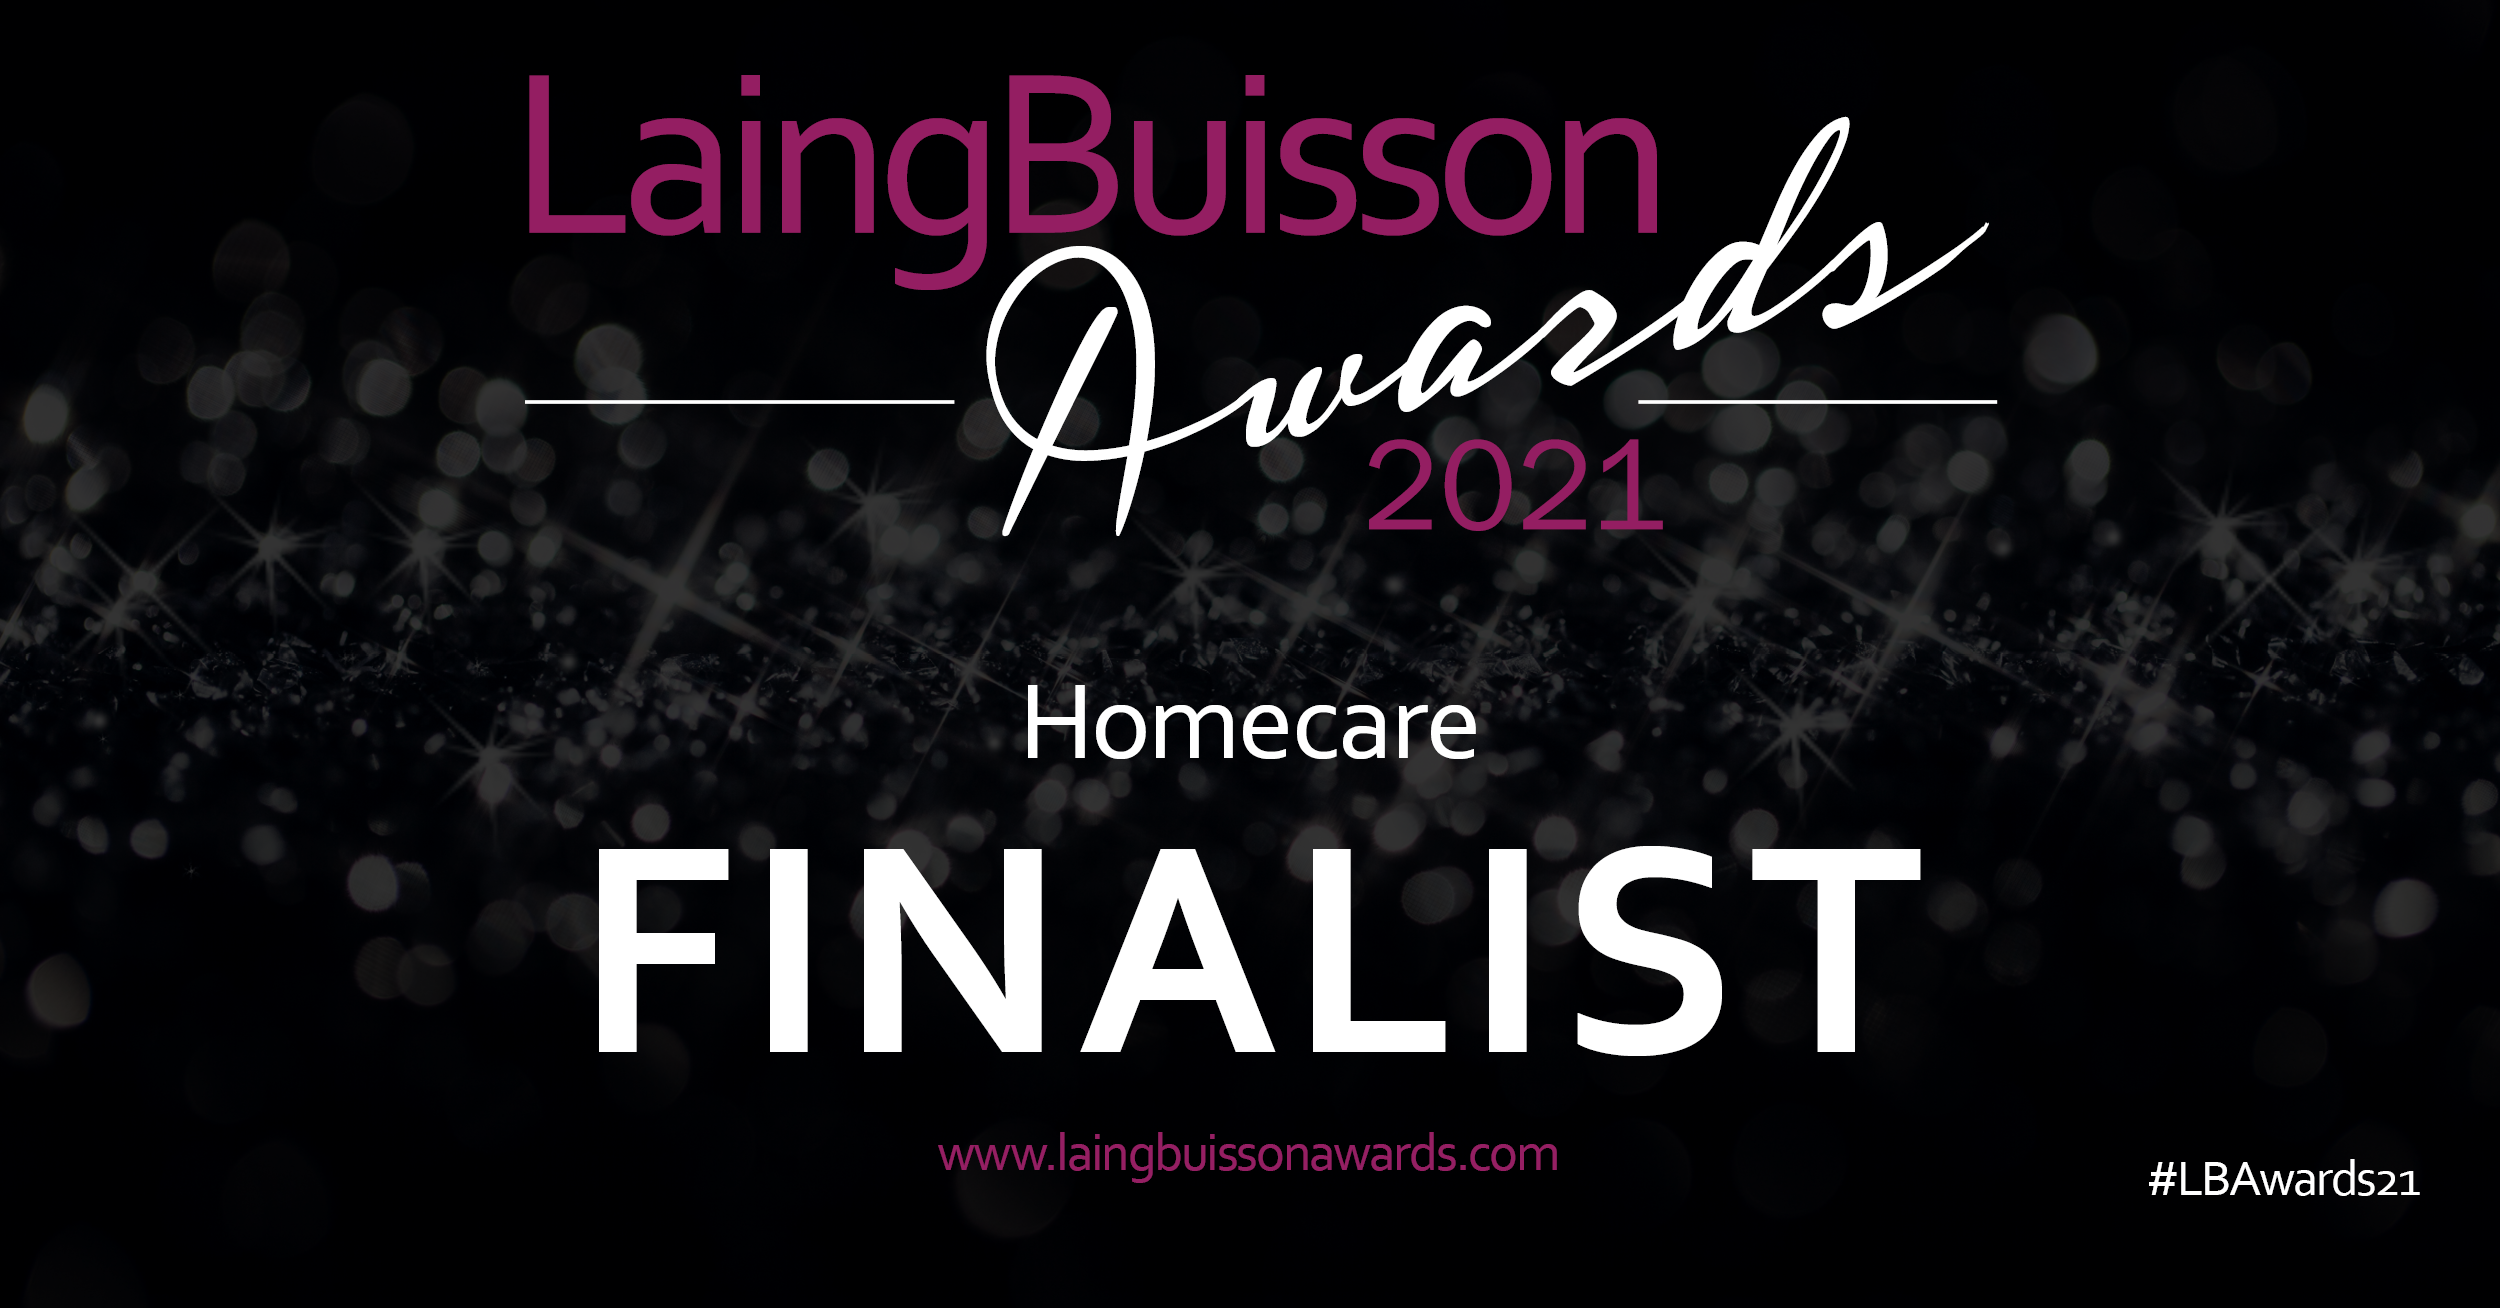 BelleVie Shortlisted for a LaingBuisson Award